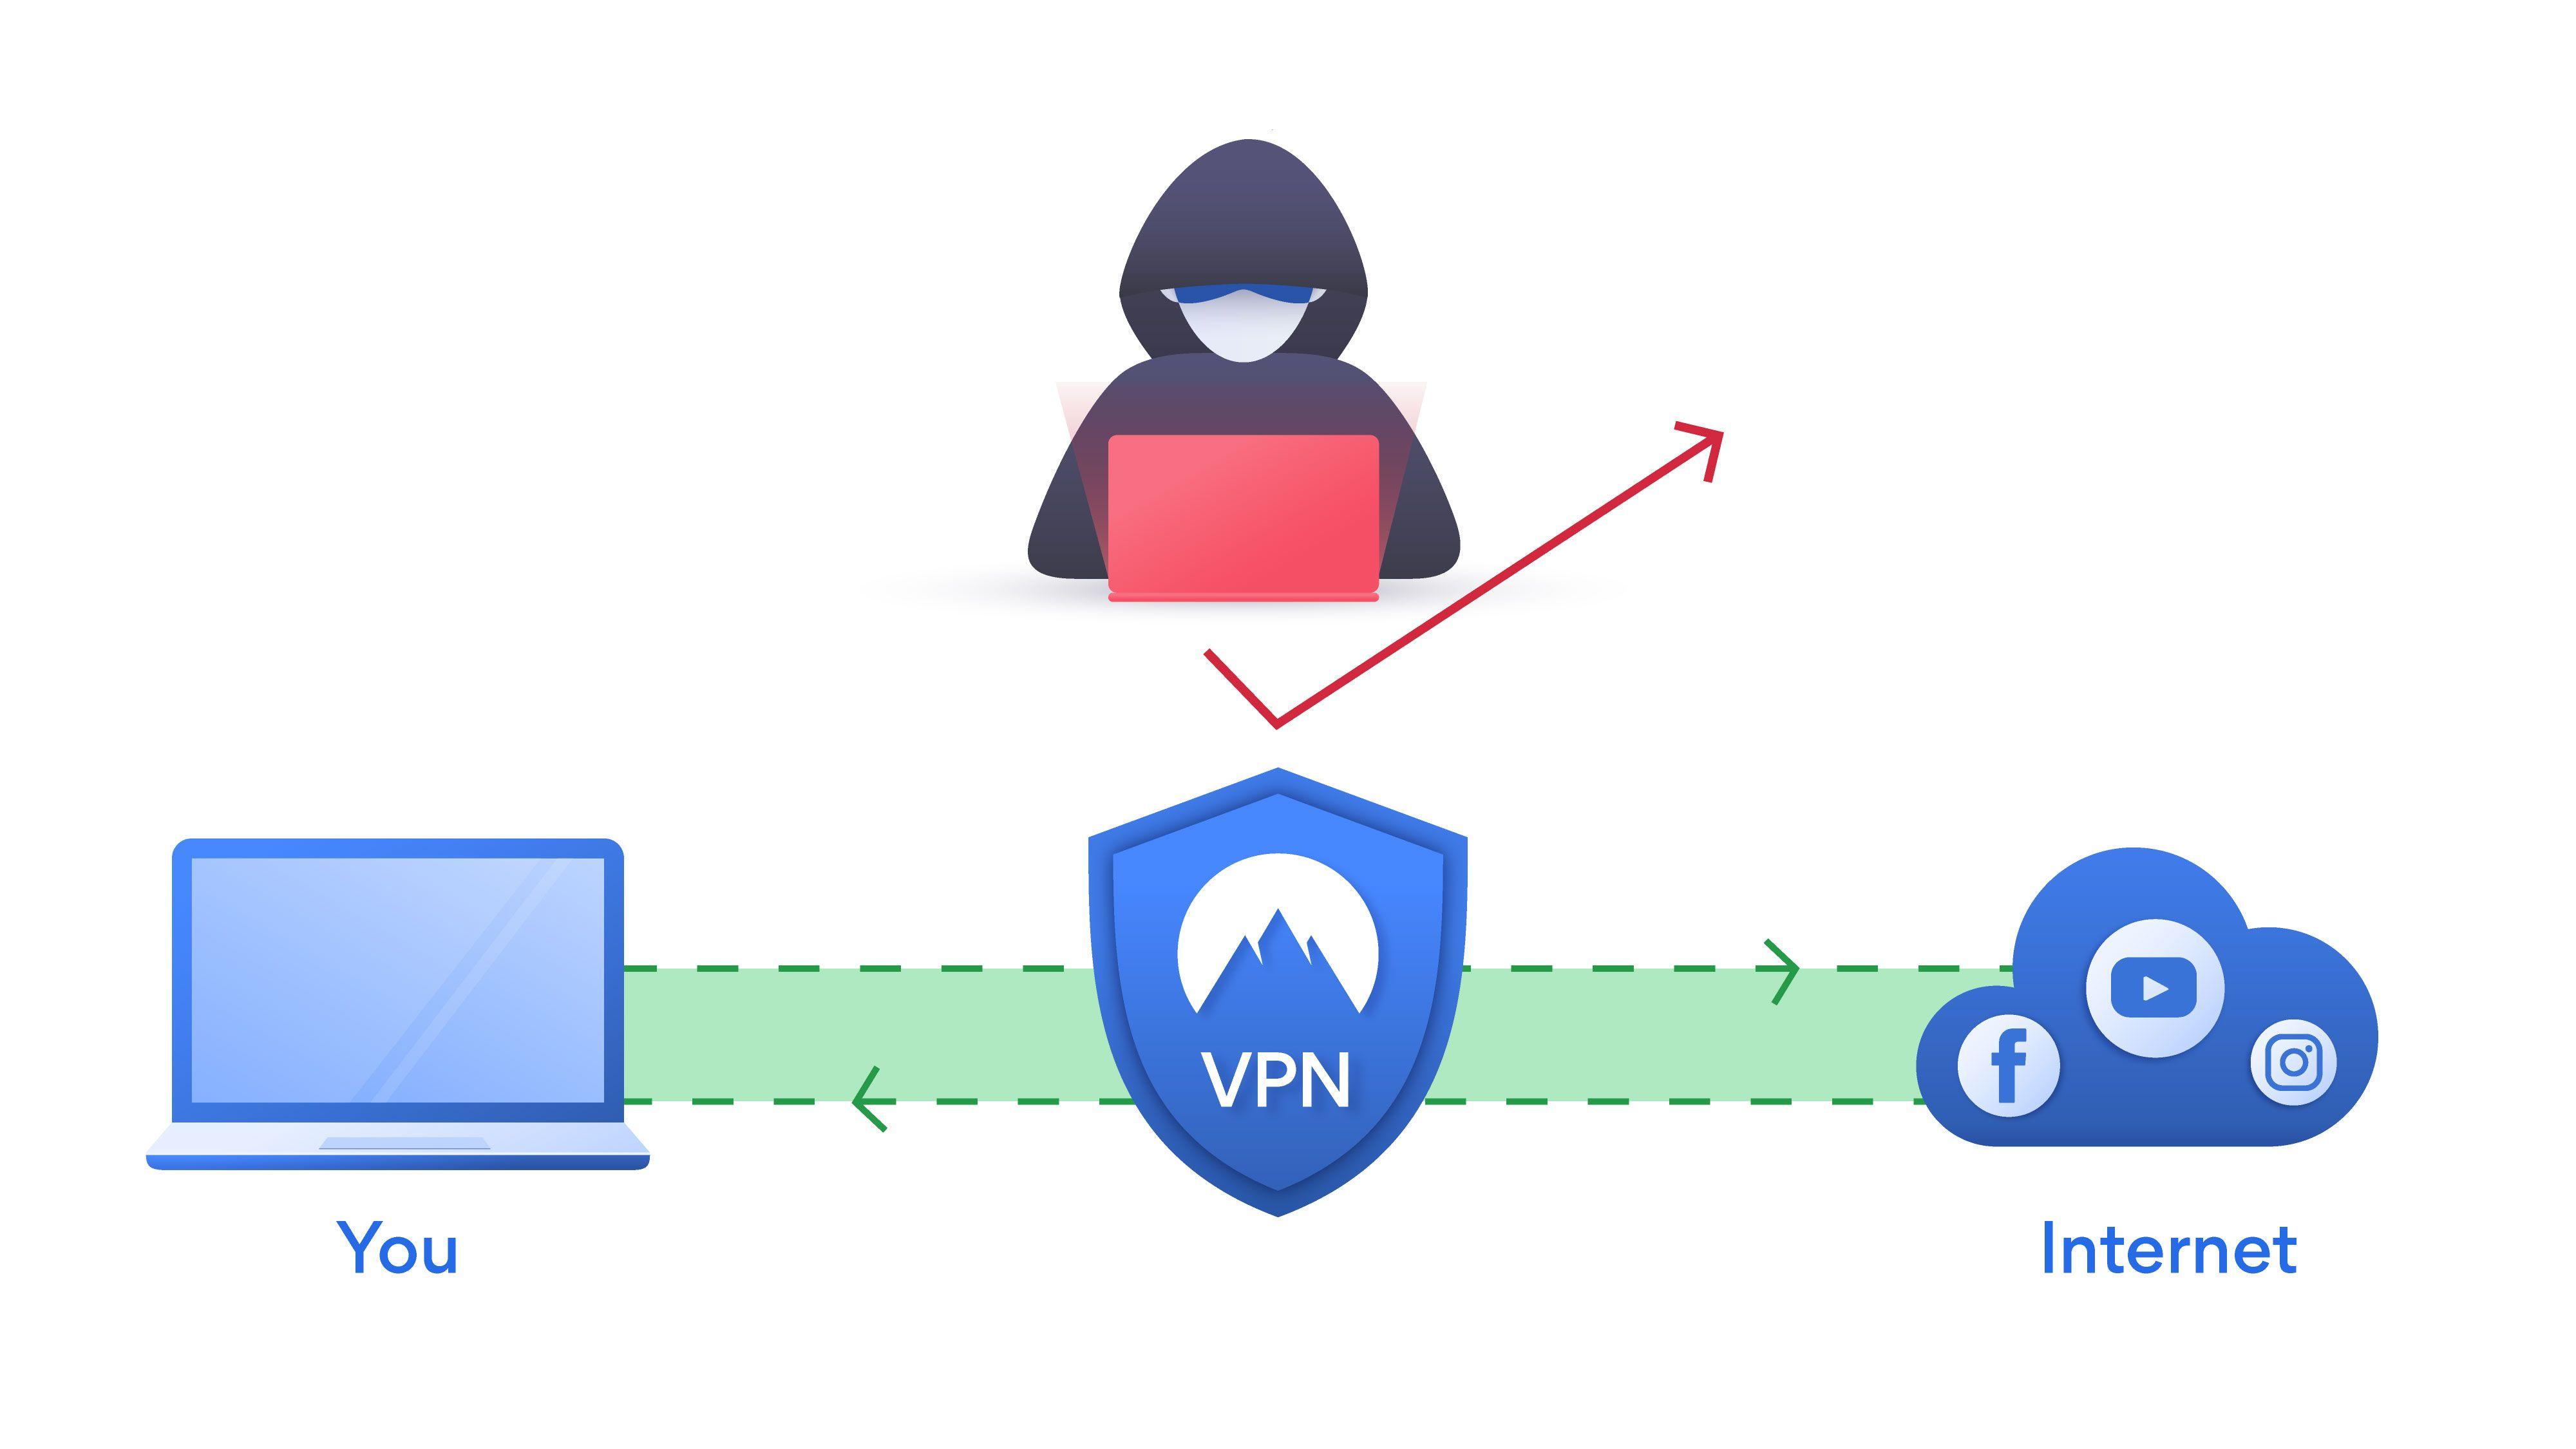 813e2de08dcd316aa5a9cf061556d7e2 - How To Change Vpn Location On Laptop